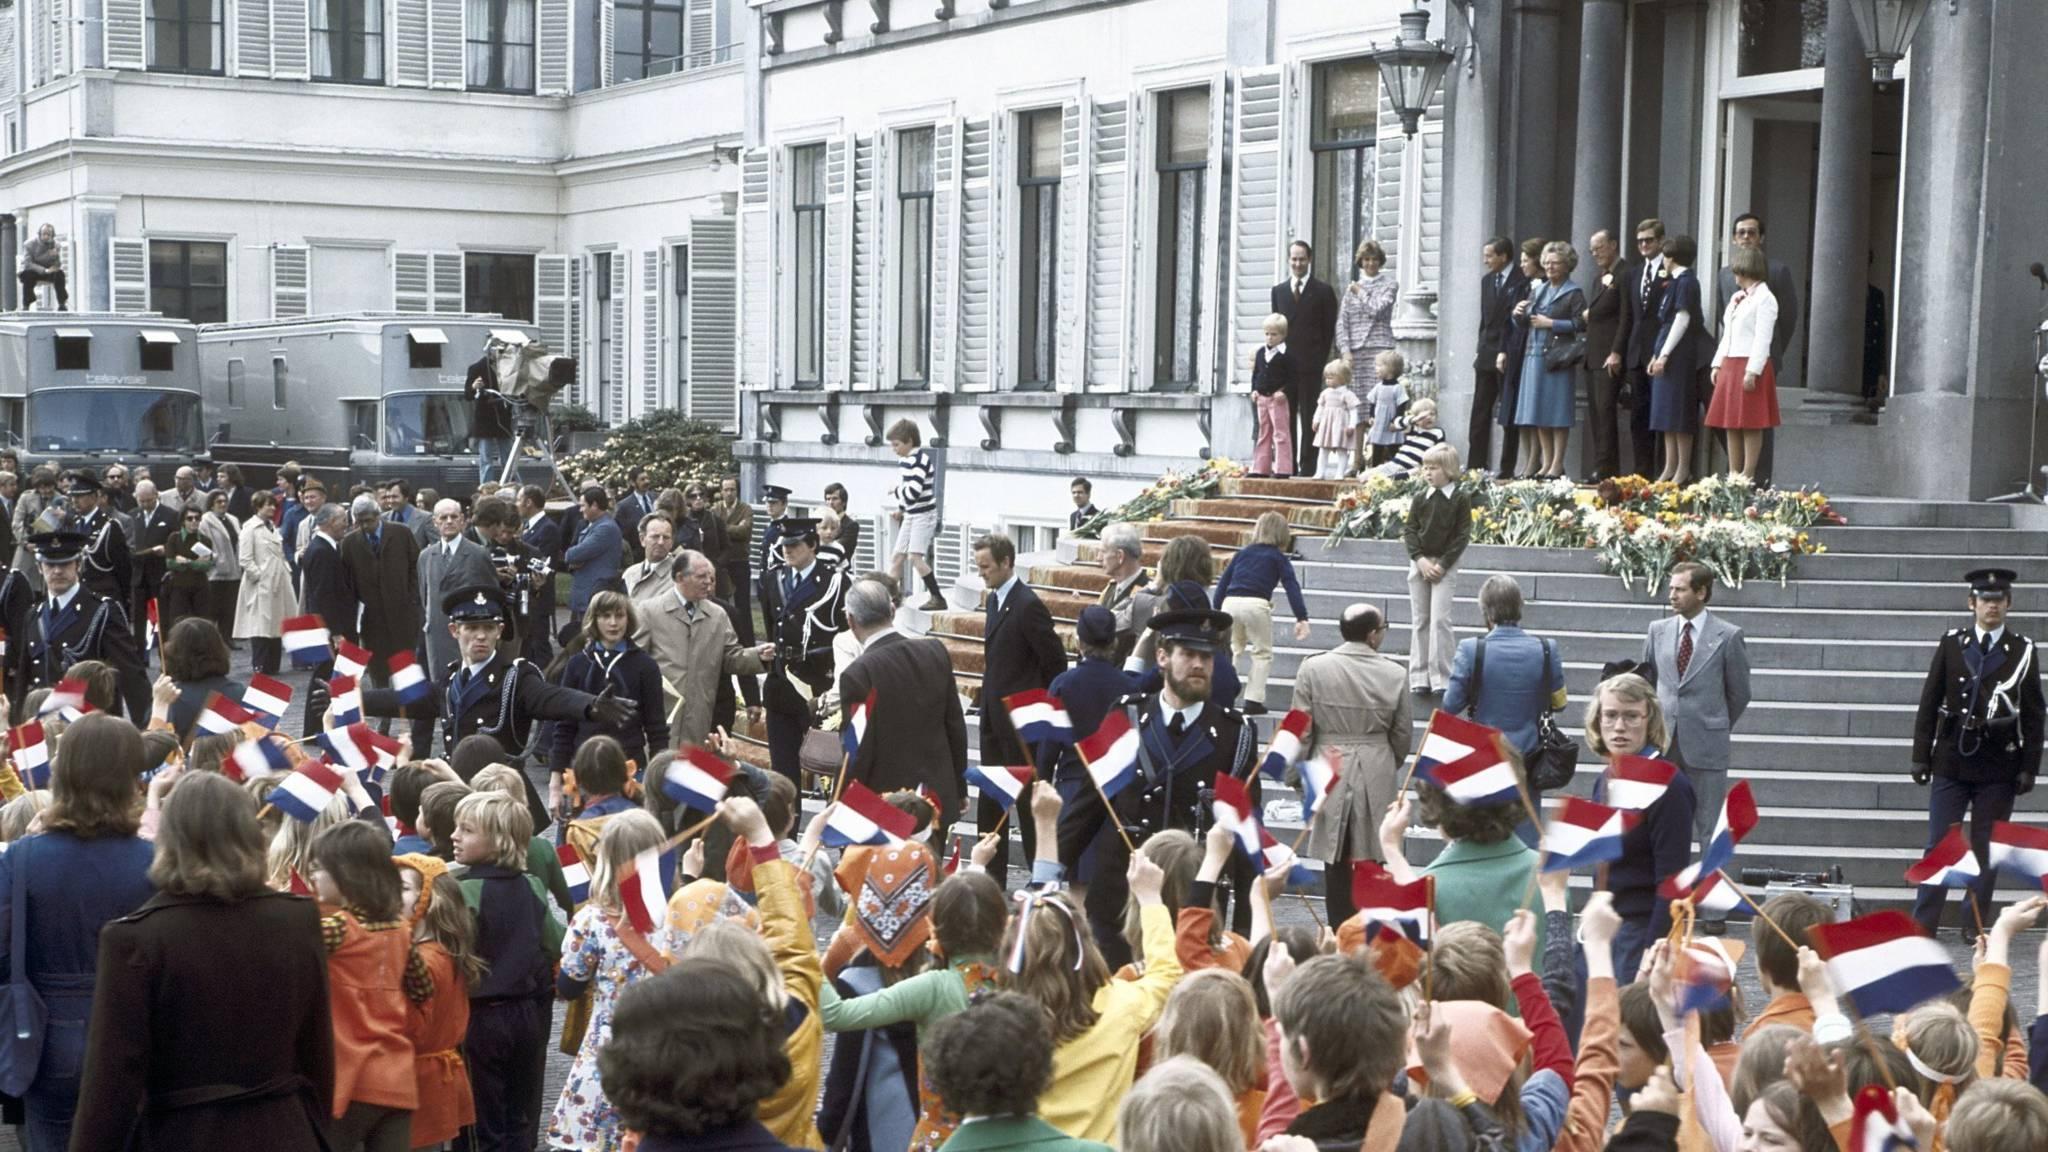 Queen Juliana celebrating her birthday on the premisis of Soestdijk Palace